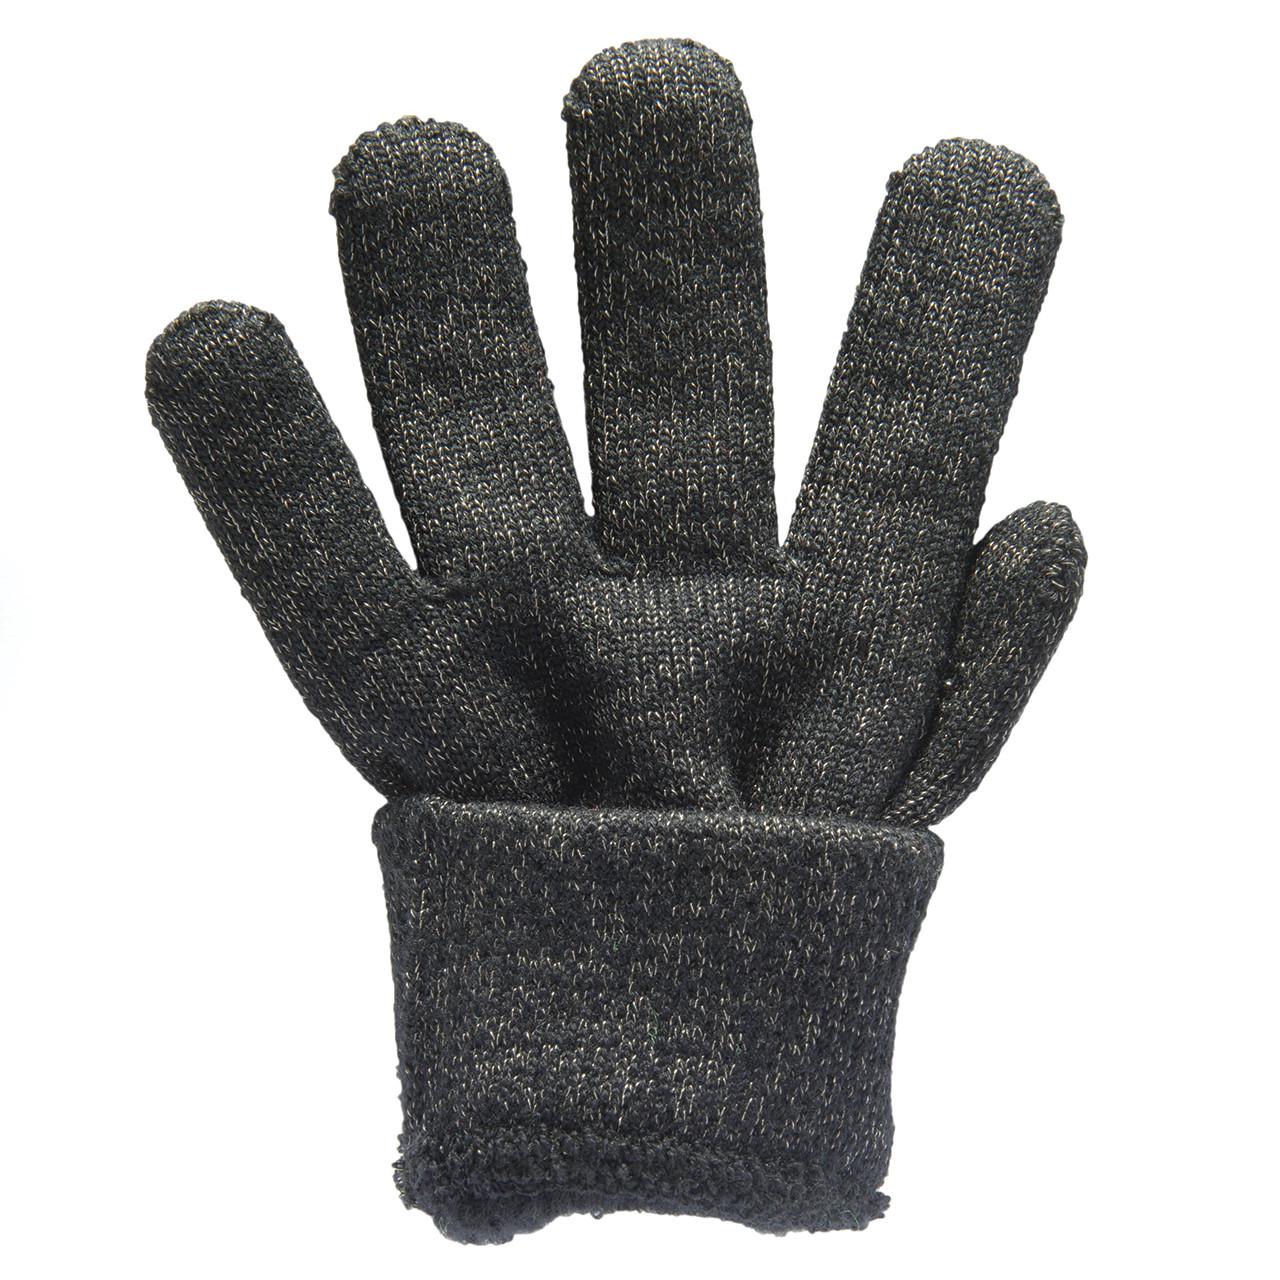 Agloves Sport Touchscreen Gloves: Polar Sport Smartphone Touchscreen Winter Gloves